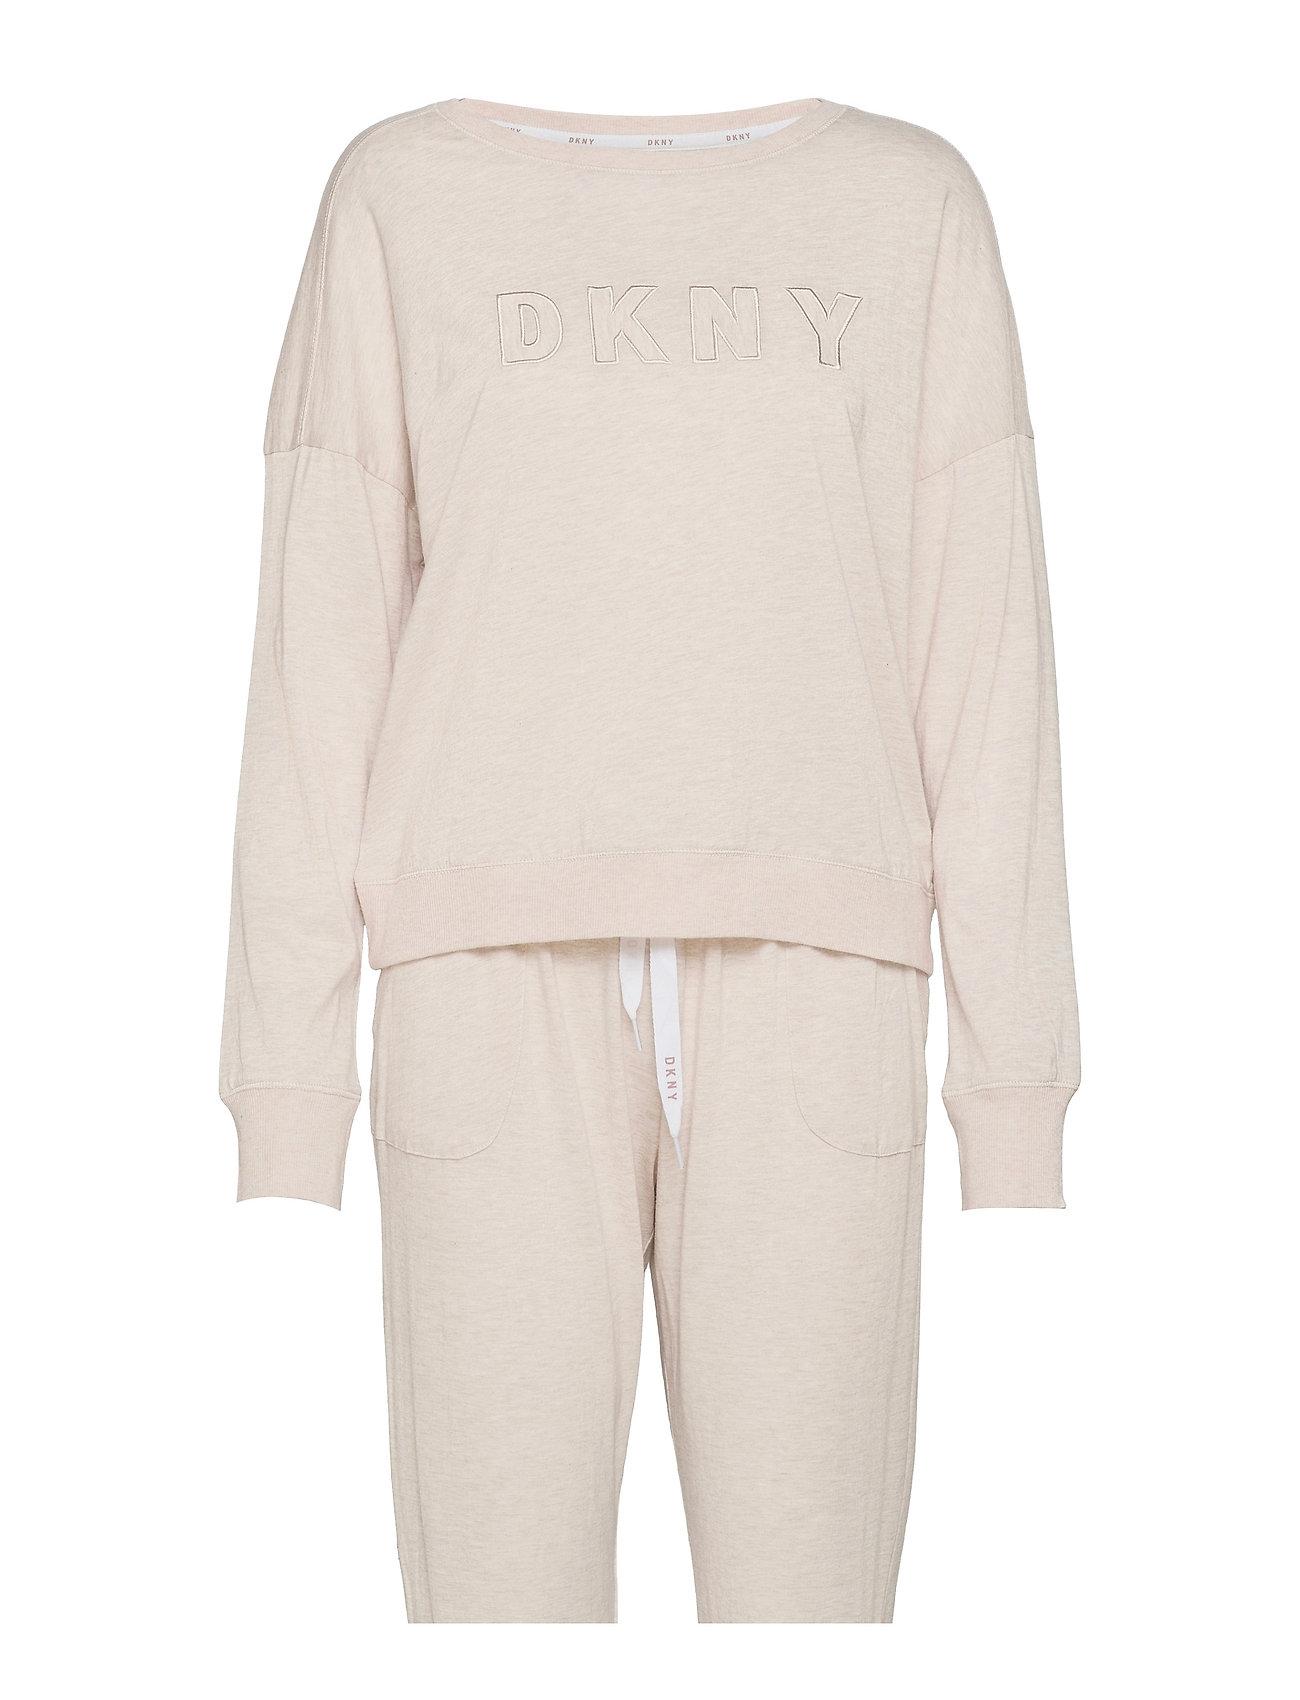 Dkny New Signature L/S Top & Jogger Pj Pyjamas Nattøj Beige DKNY Homewear